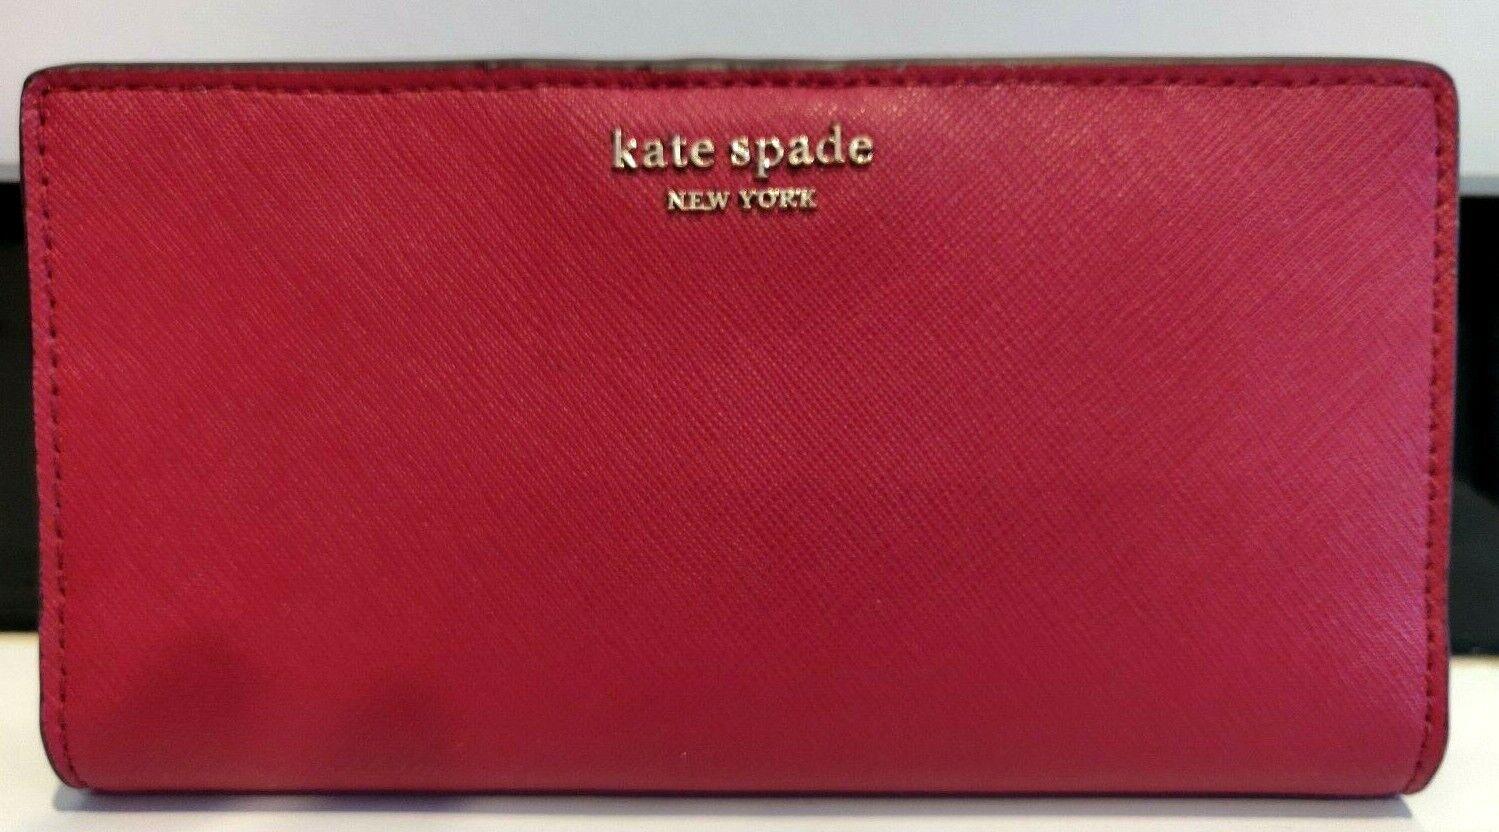 * TEST Cameron Lg Slim Bifold Wallet Cherry Red Leather WLRU5444 NWT FS